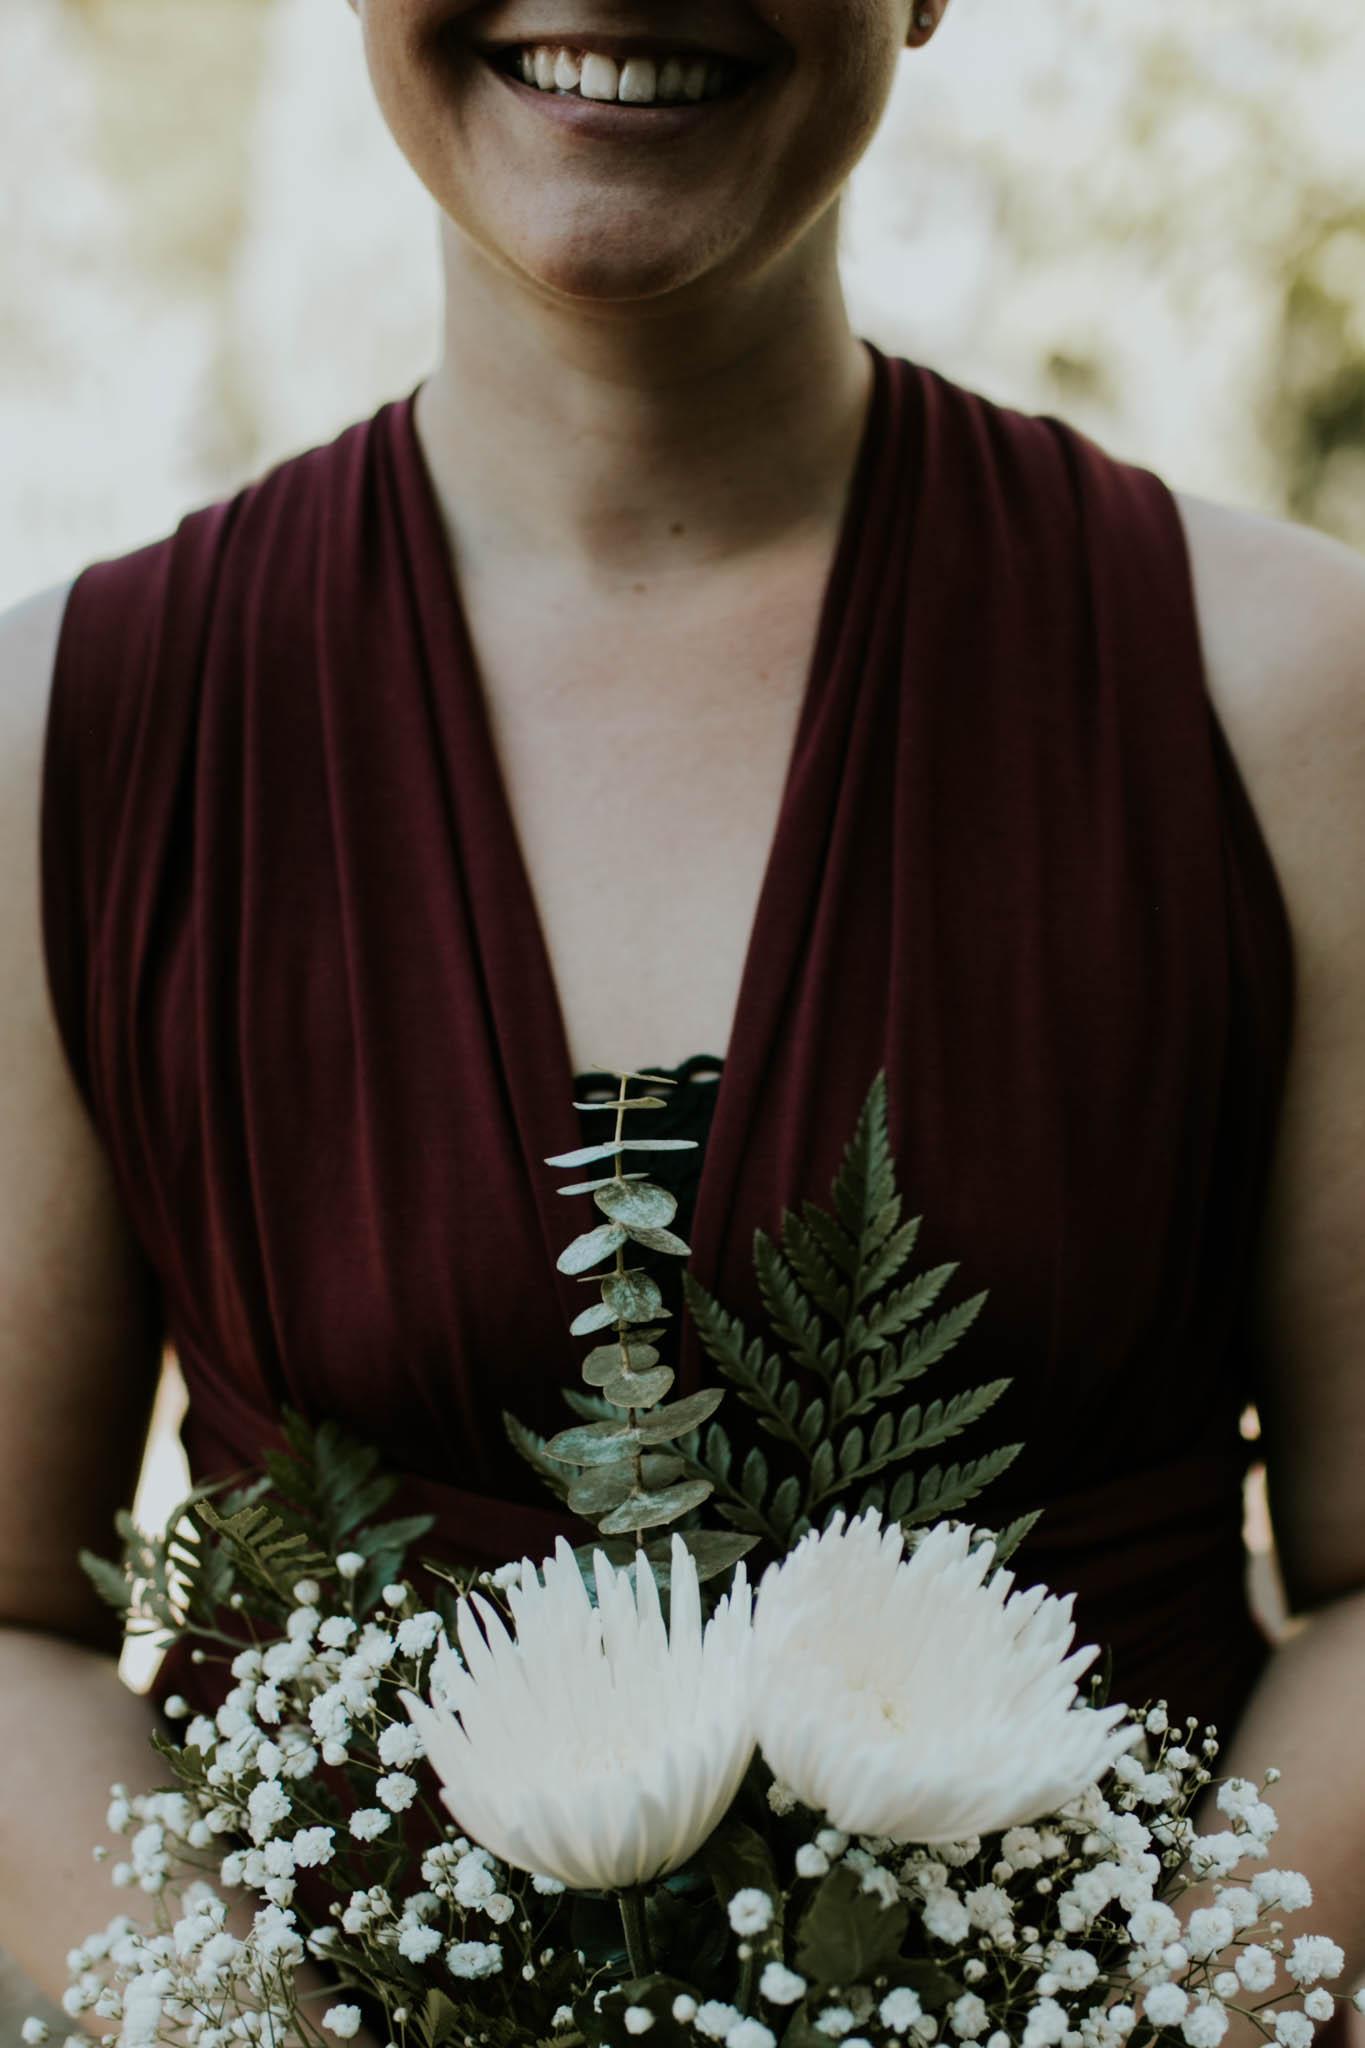 Wedding Photography, Redden Photography, Colorado Wedding, Oregon Wedding, Oregon Wedding Photography, Elopements, Elopement Photographer, Destination Weddings, Destination Wedding Photographer